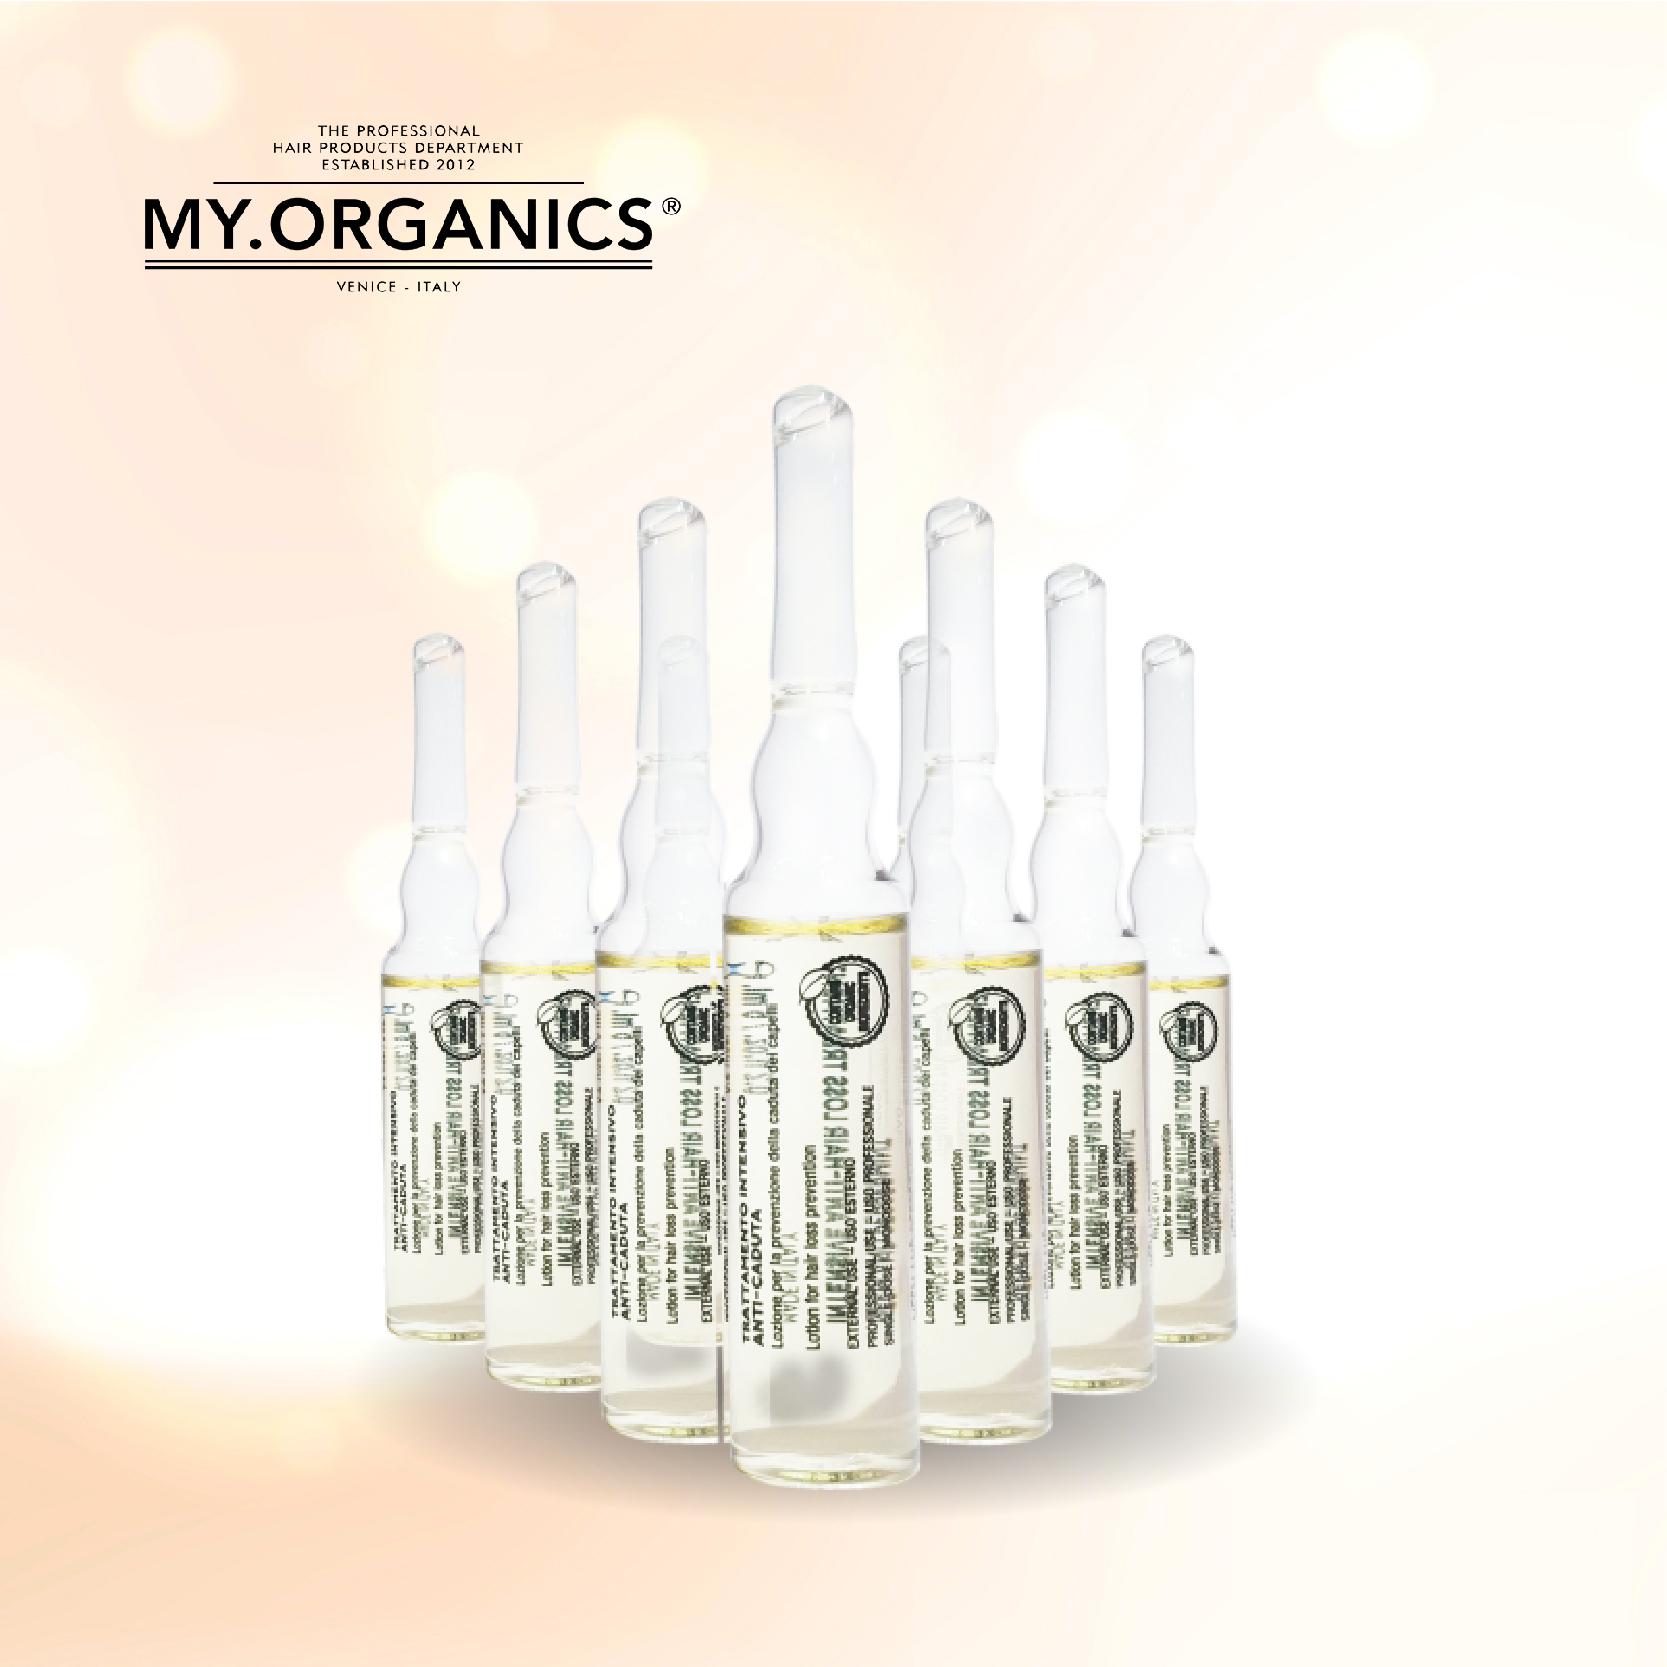 My.Organics 再生活发强效有机疗程